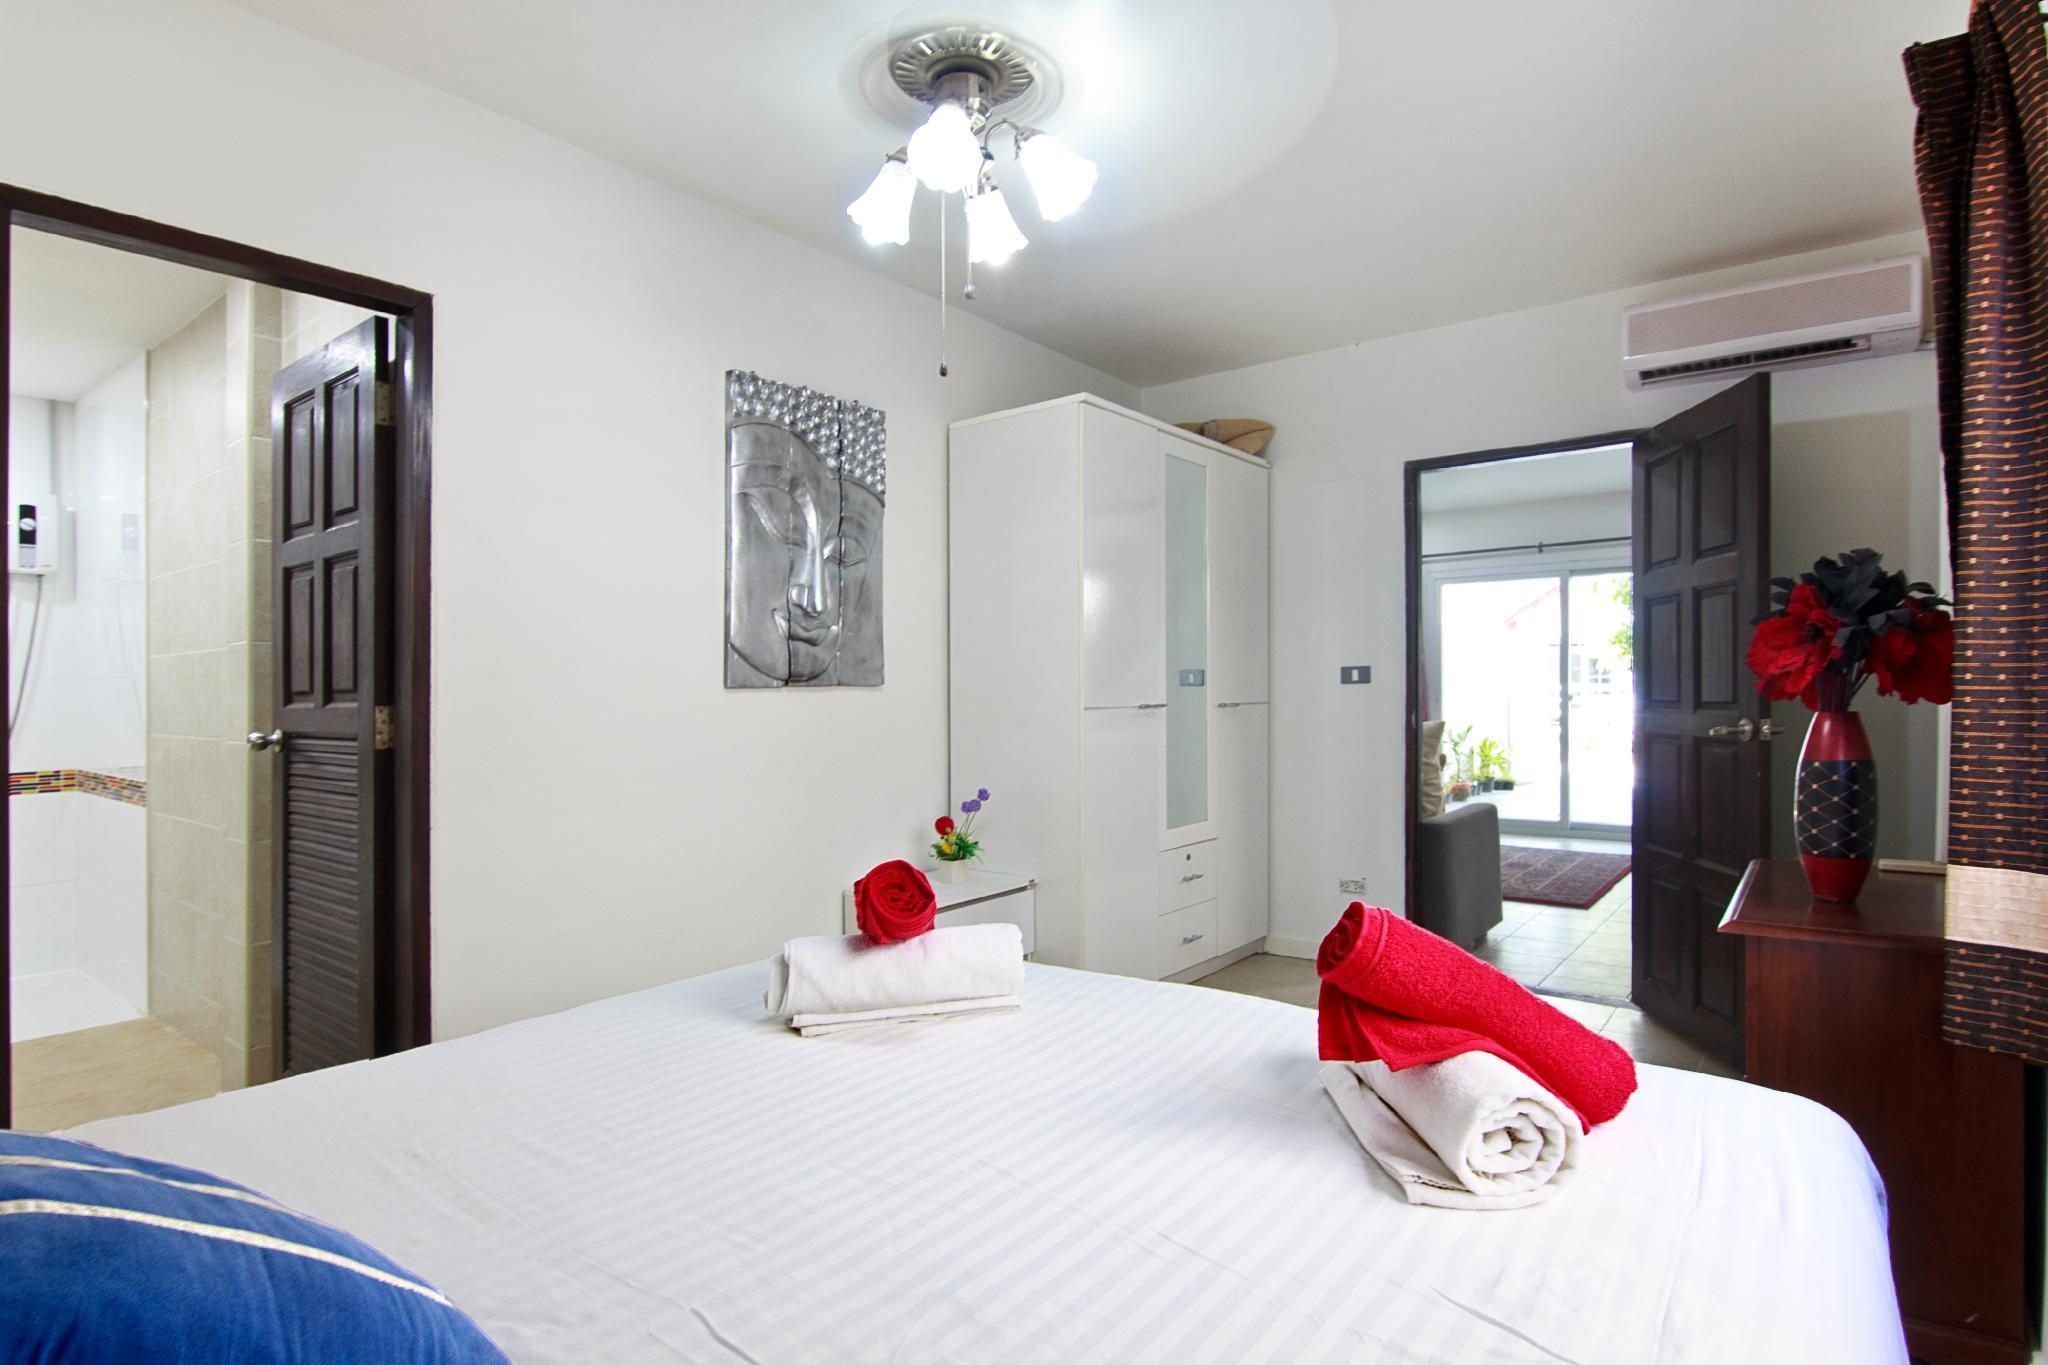 4 Bedroom Private house in Fishermans Village บ้านเดี่ยว 3 ห้องนอน 2 ห้องน้ำส่วนตัว ขนาด 500 ตร.ม. – หาดบ่อผุด